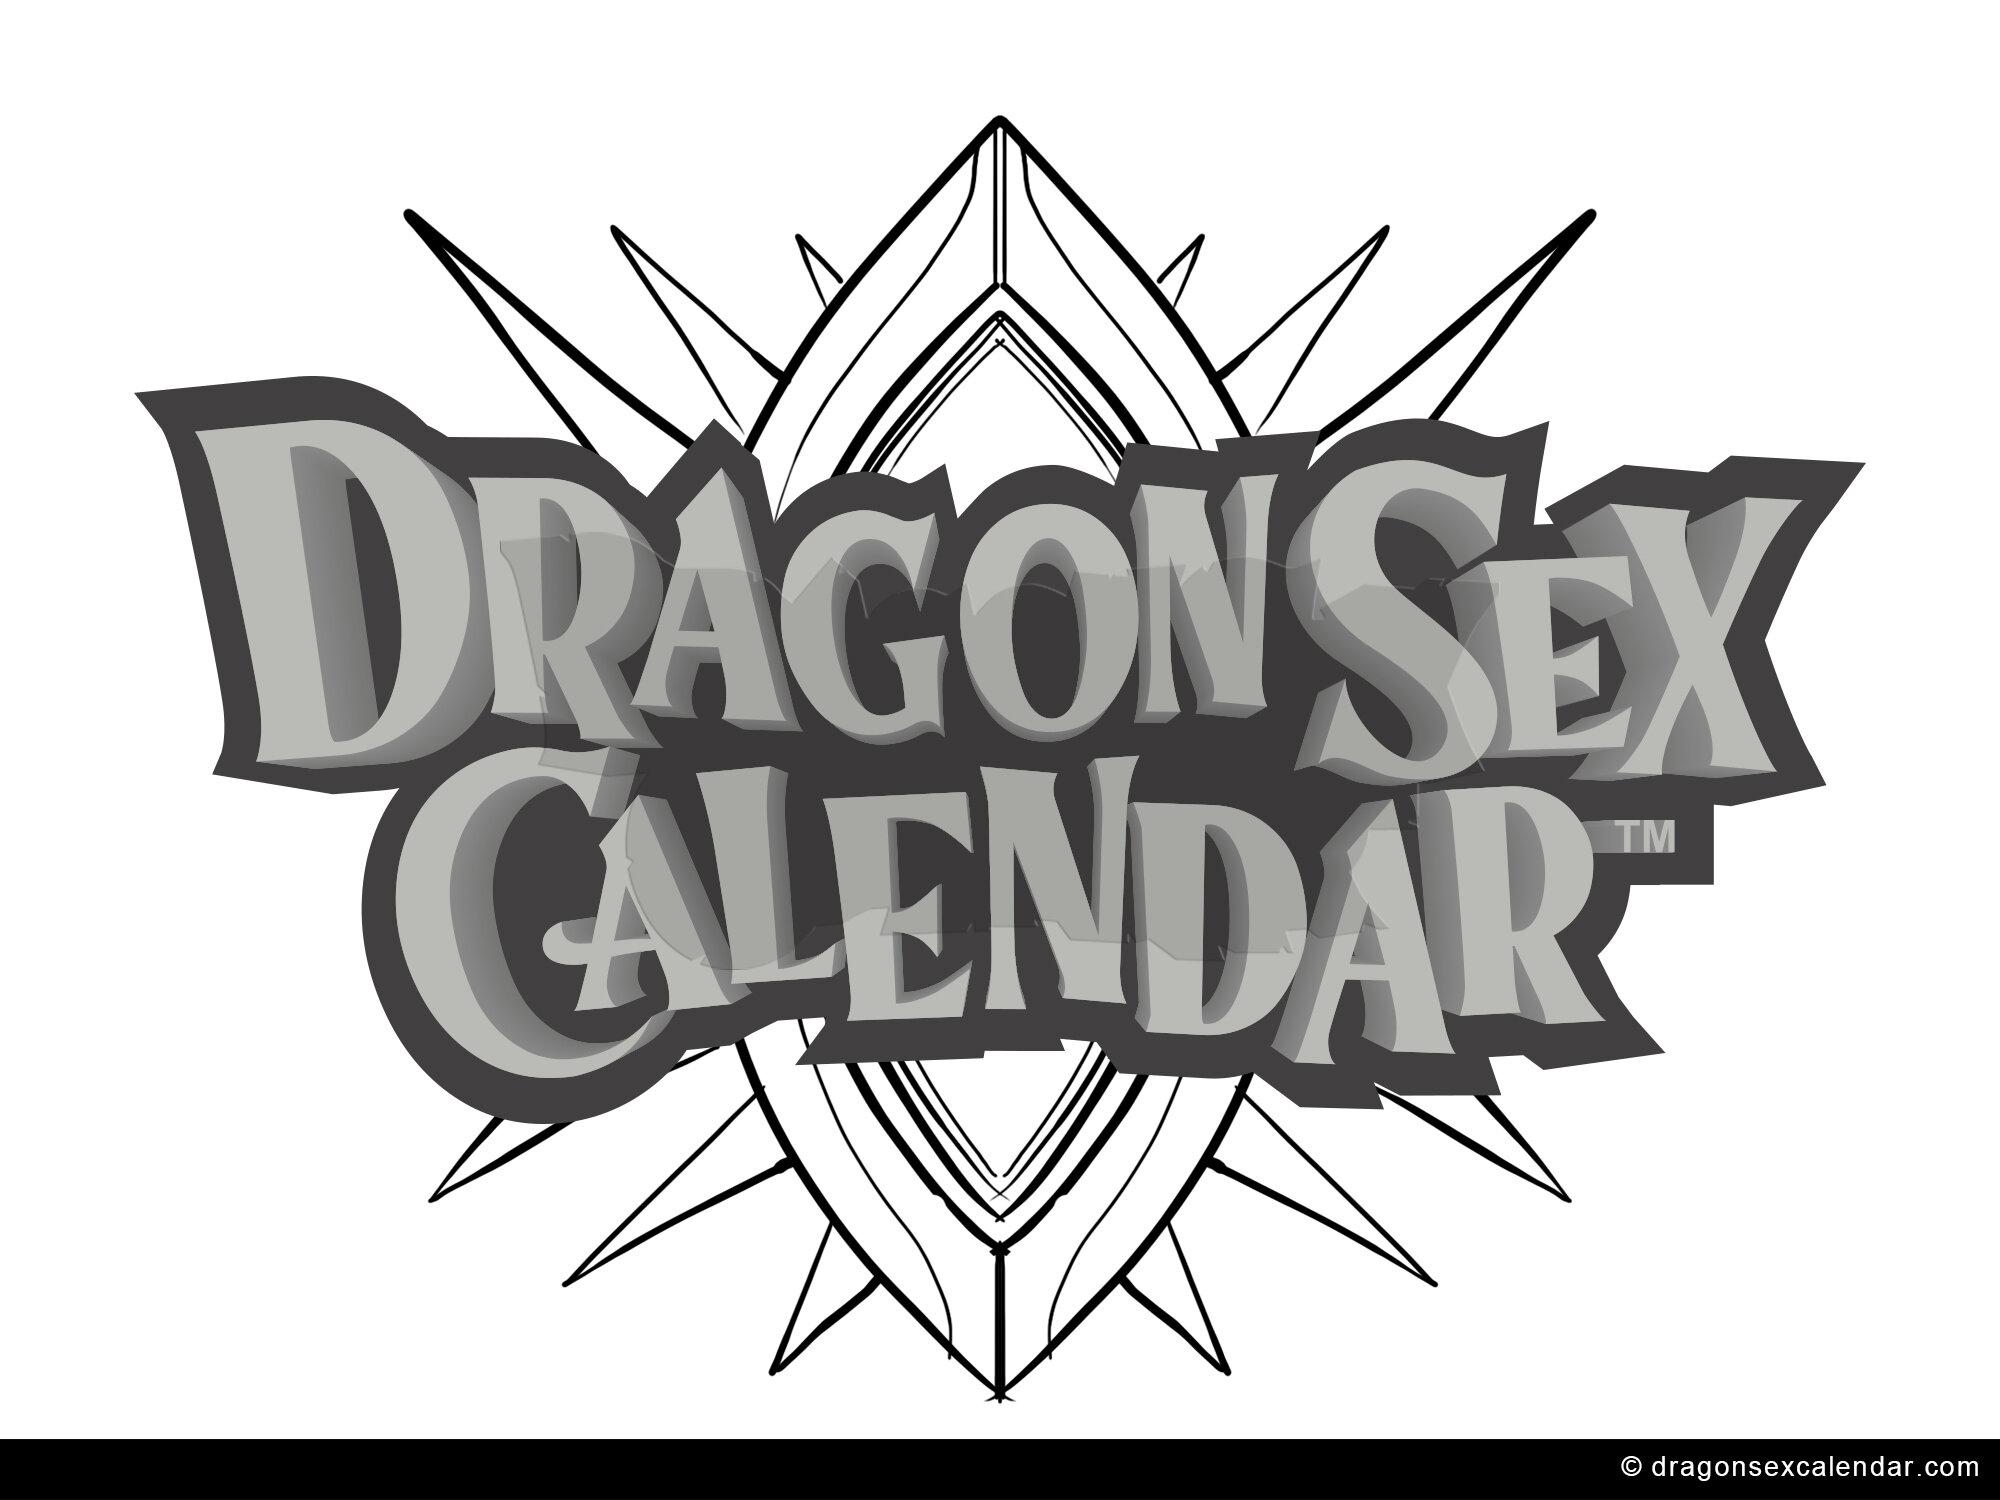 Dragonsexcalendar4.jpg